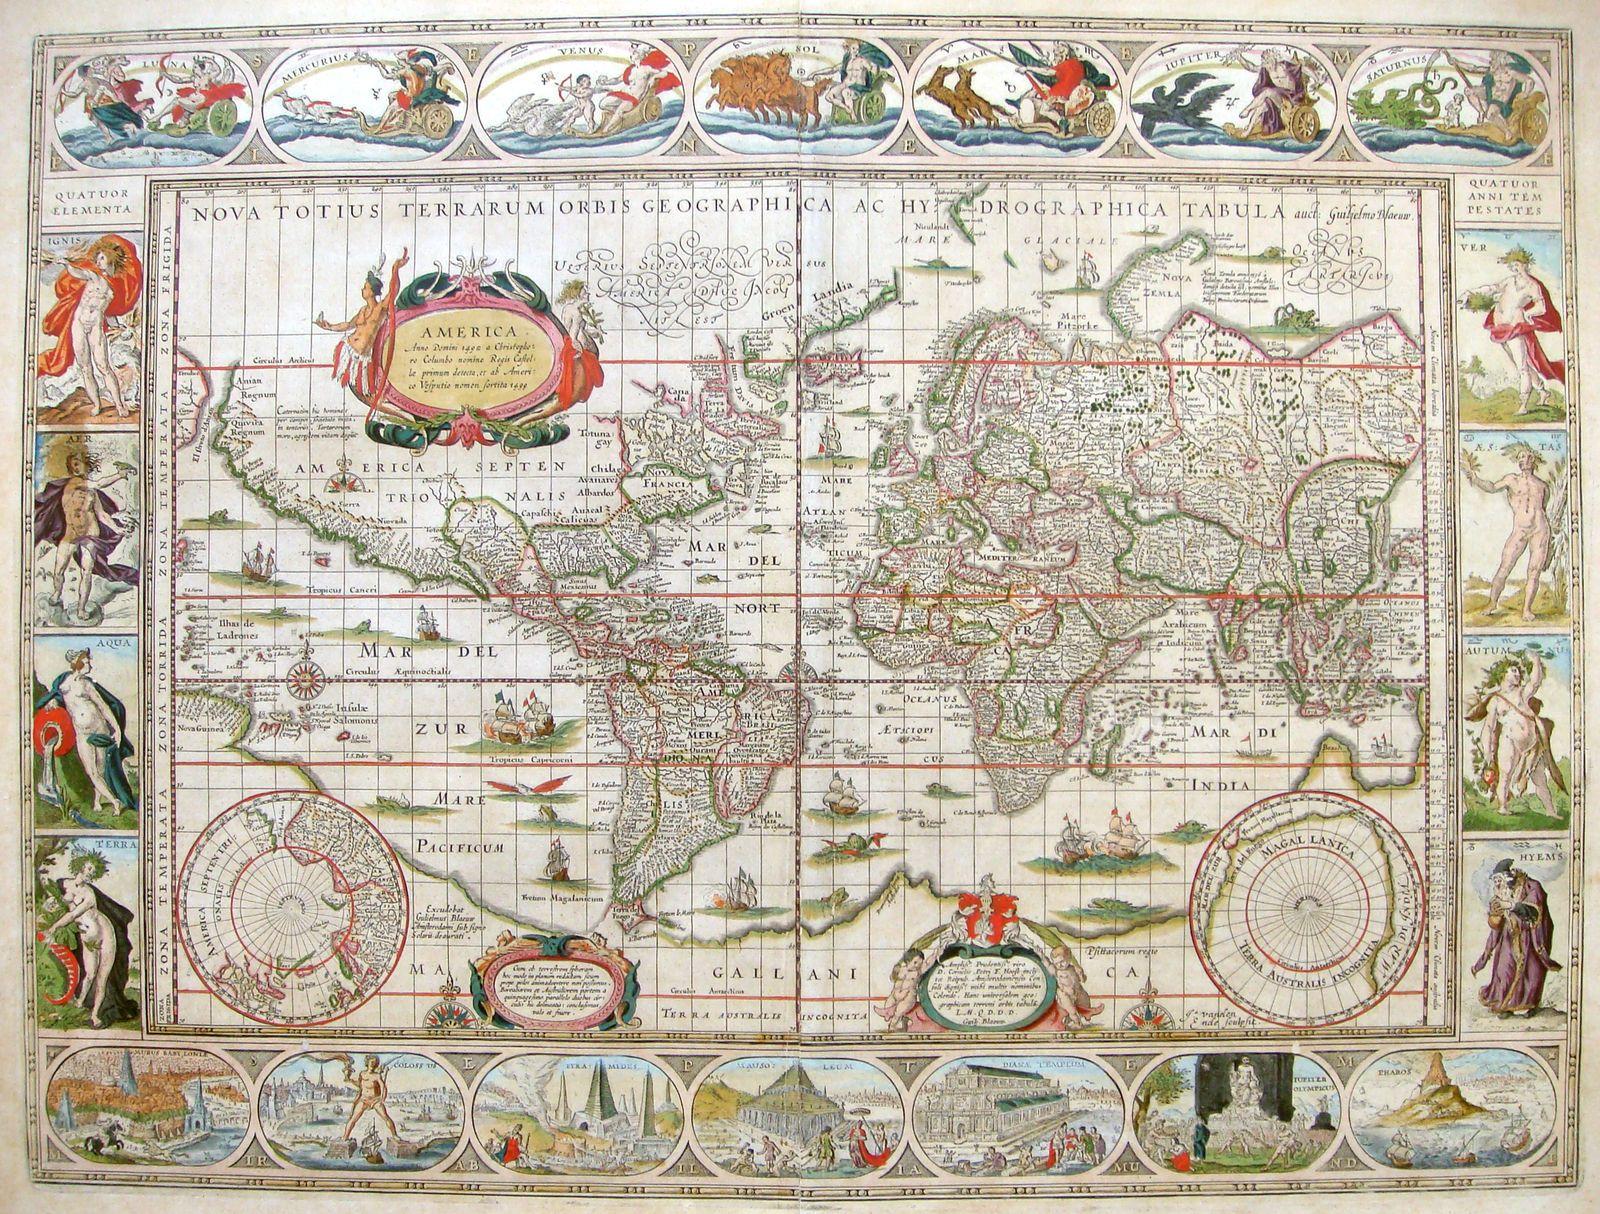 Vintage map from httpjpmaps map pinterest vintage map from httpjpmaps canvas materialworld gumiabroncs Images